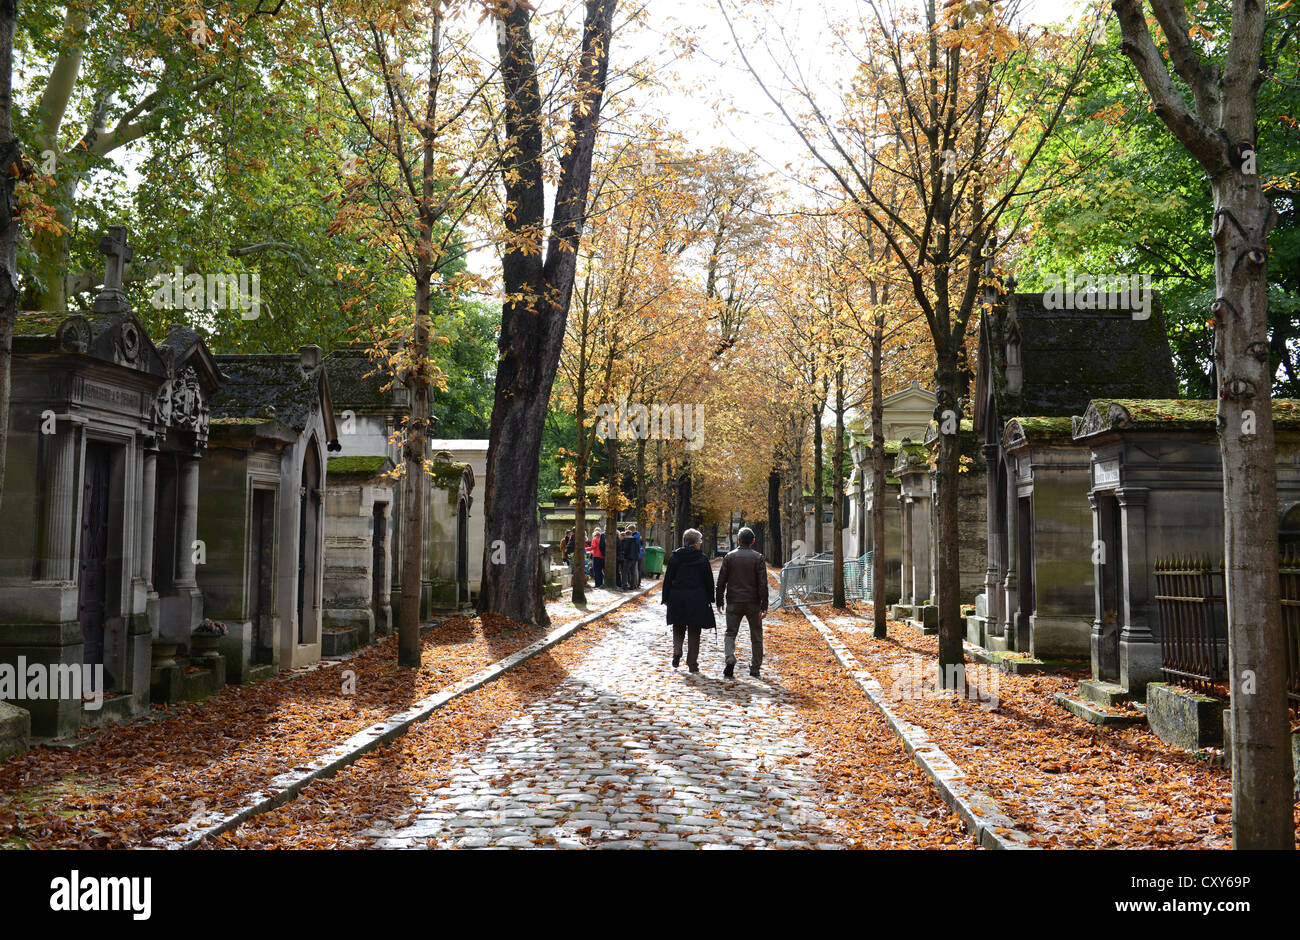 Cimetiere Pere Lachaise Cemetery Stock Photos & Cimetiere